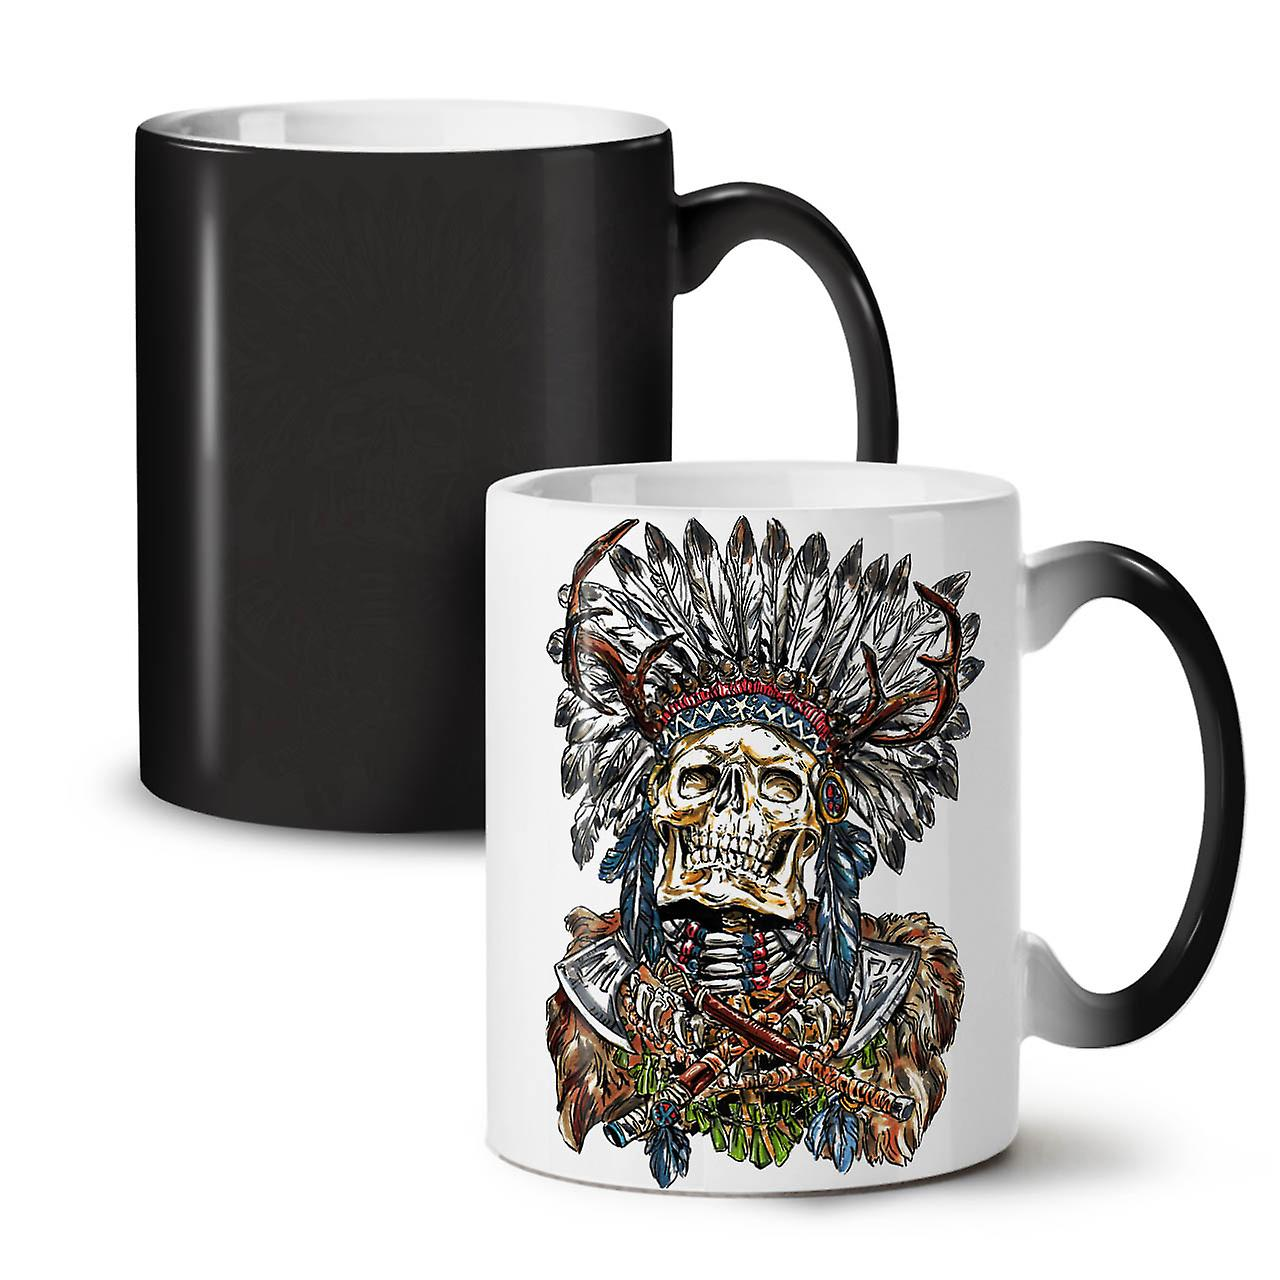 Mug Ceramic New OzWellcoda Black Tea Metal Changing 11 Coffee Native Bad Colour Guy pGqUzVSM